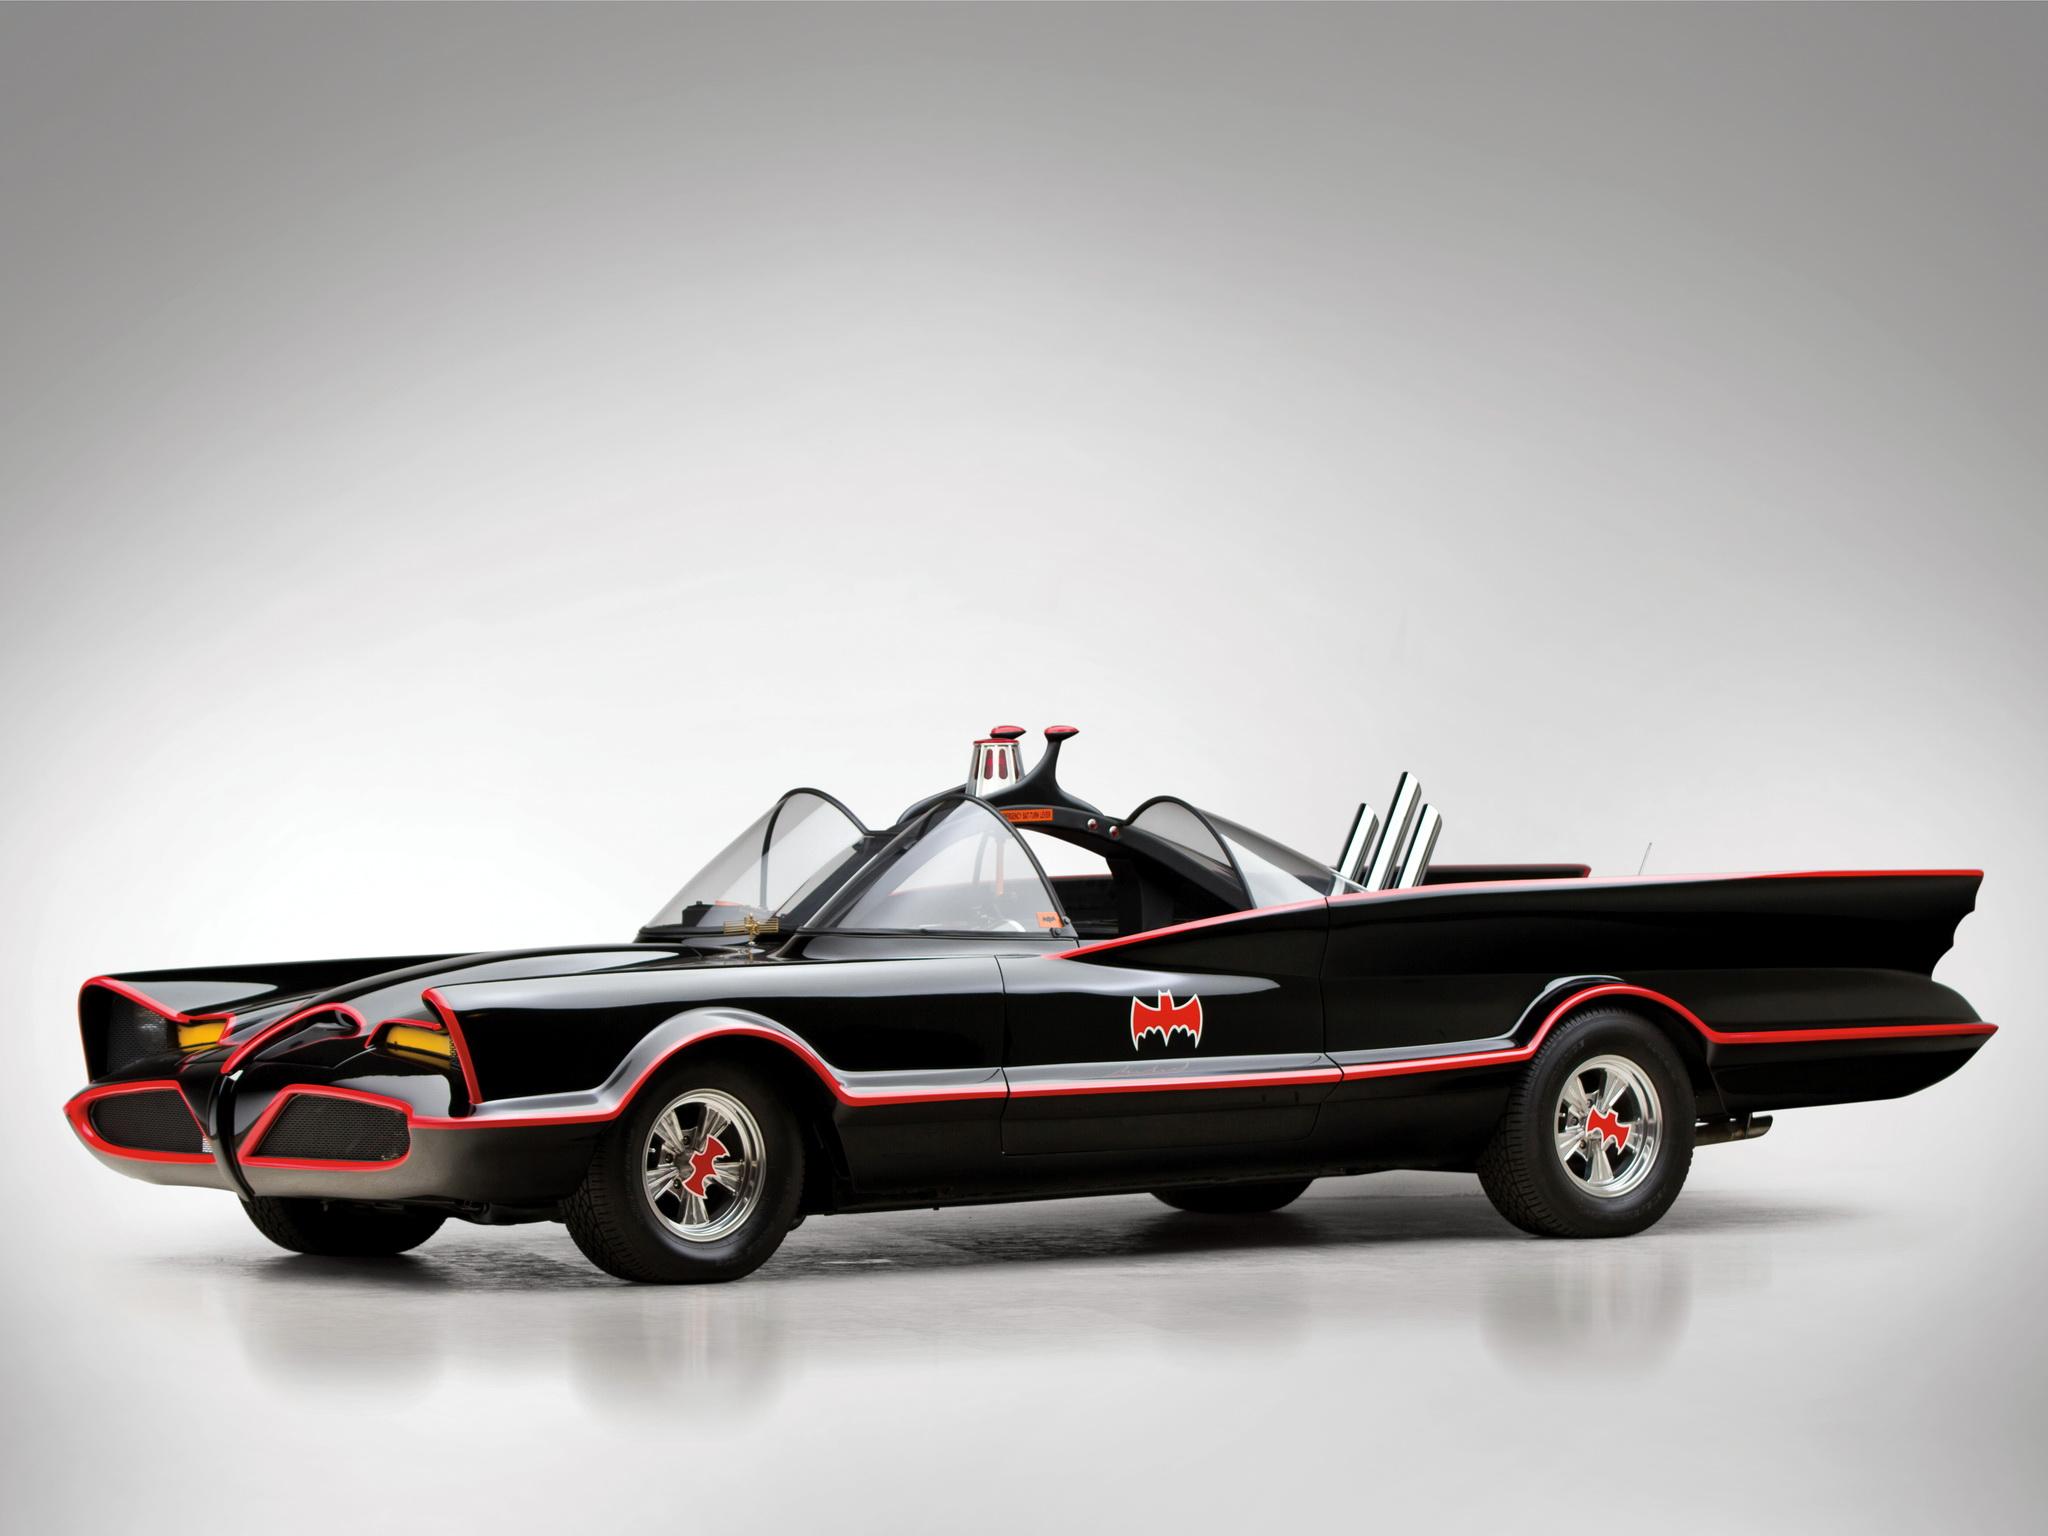 1966 Lincoln Futura Batmobile by Barris Kustom custum superhero batman 2048x1536